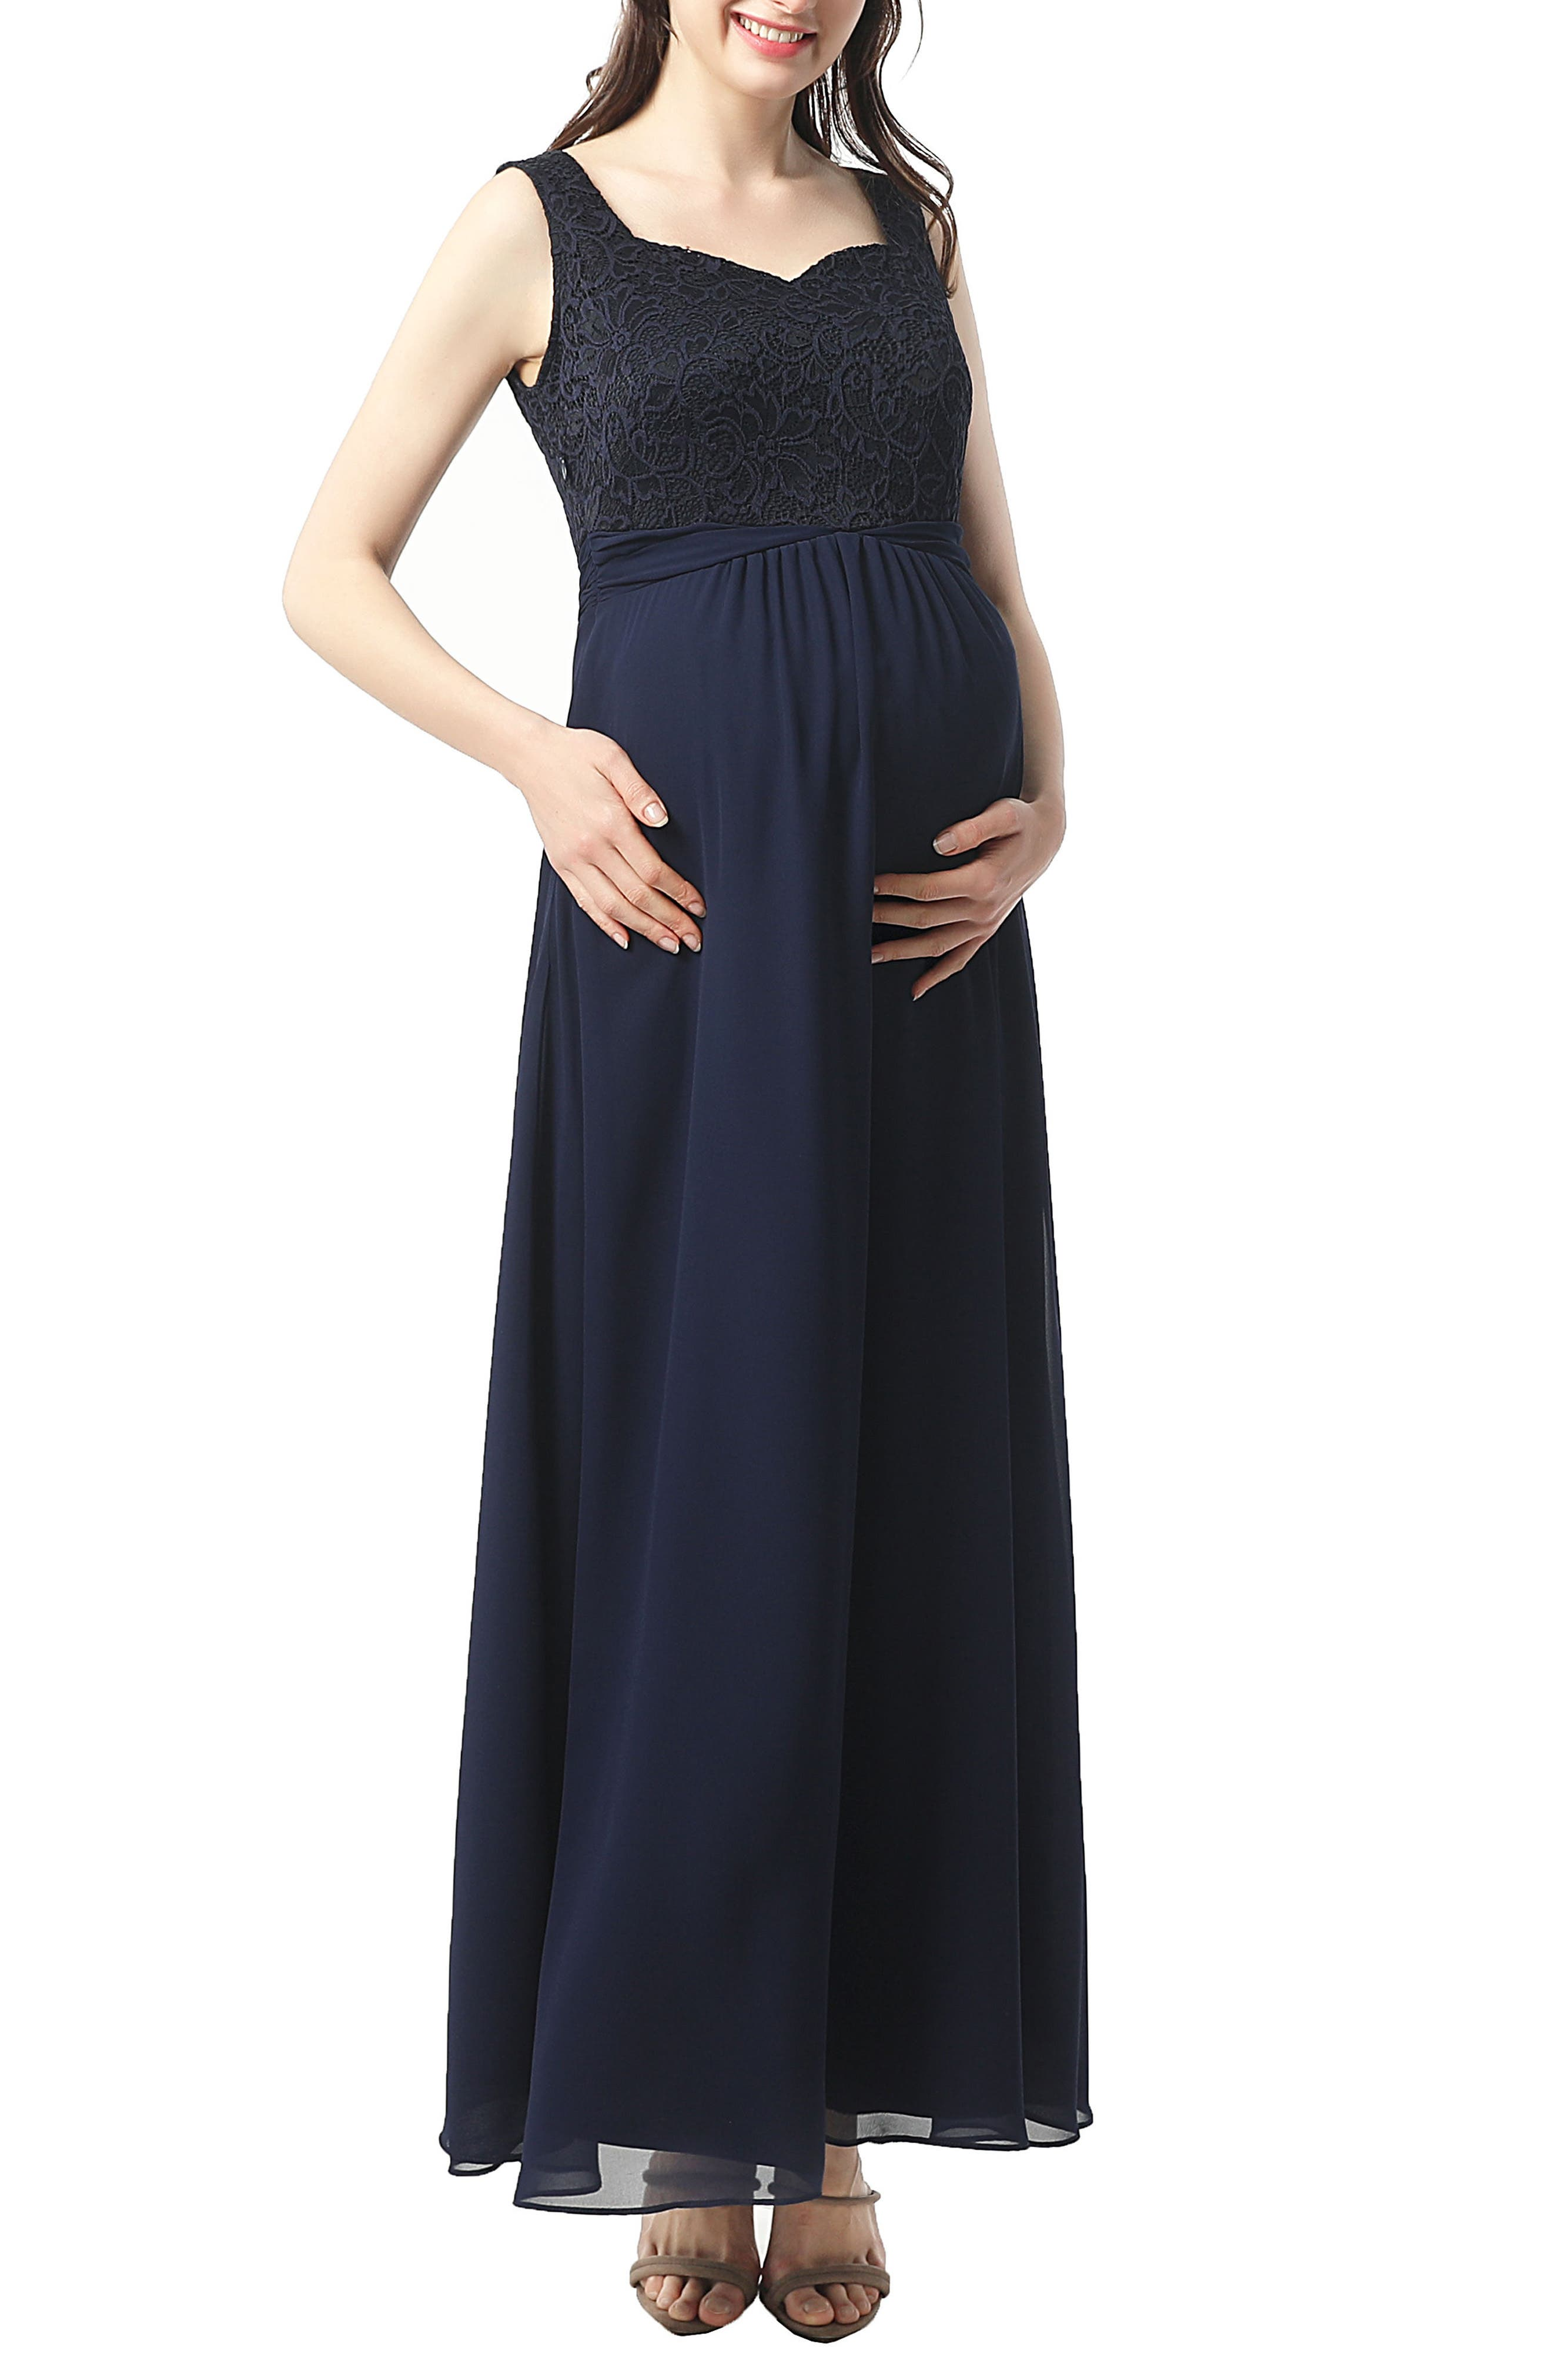 Kyra Maternity Maxi Dress,                             Main thumbnail 1, color,                             NAVY